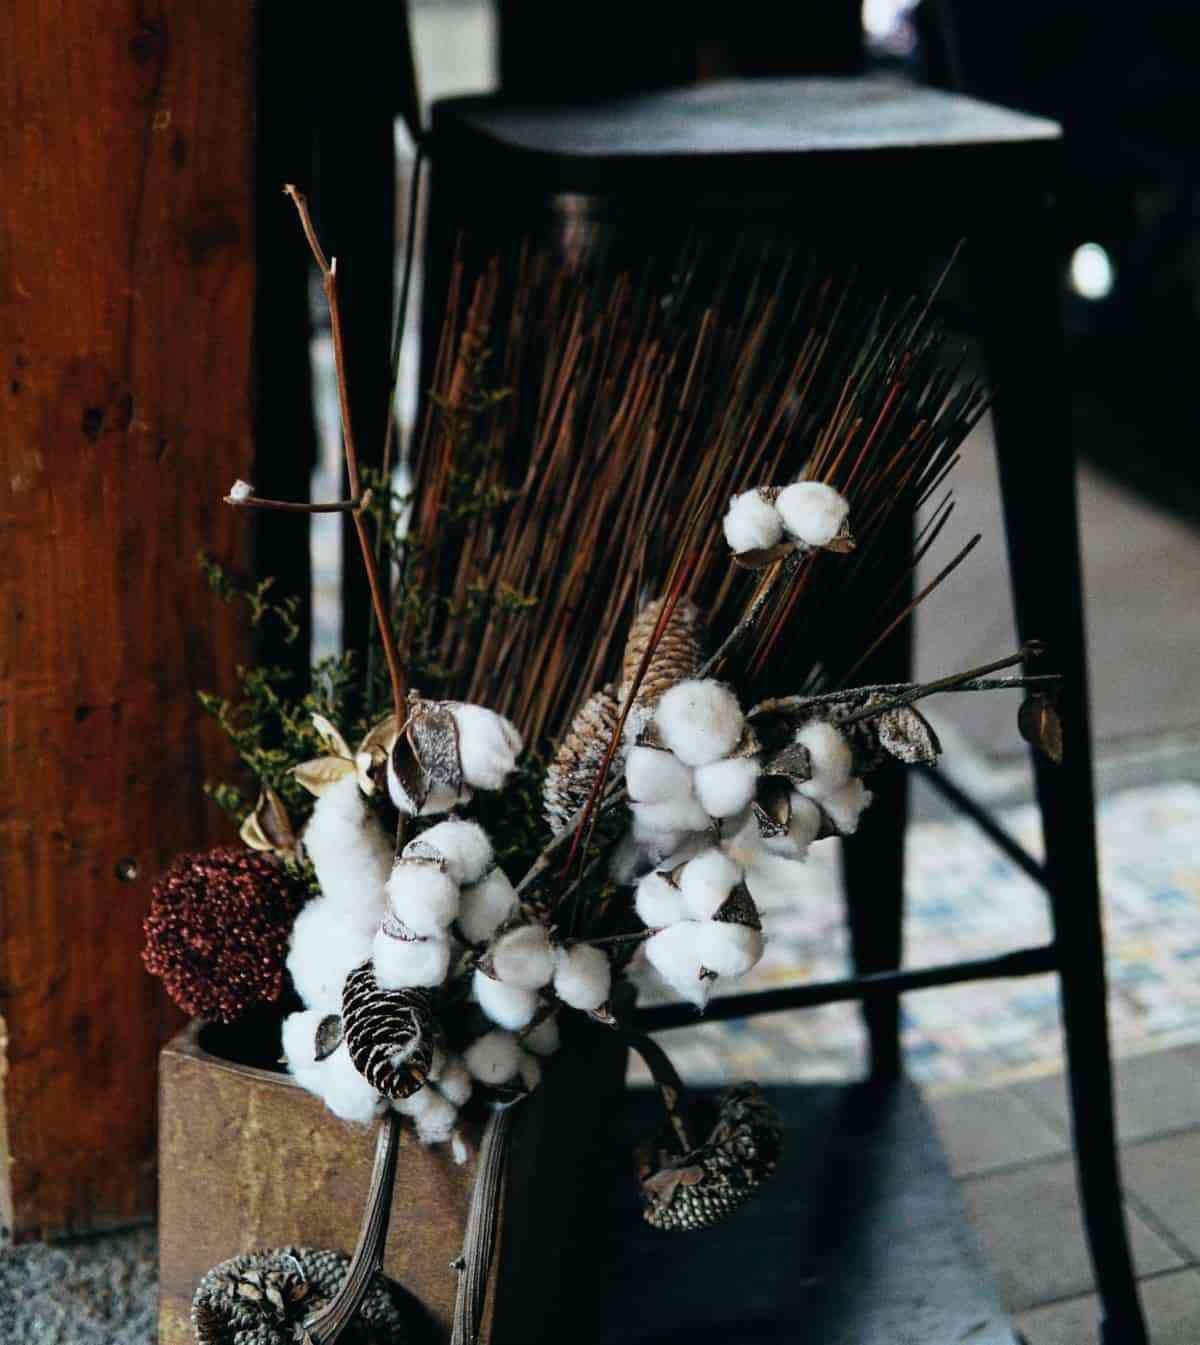 flores secas para decorarcion de otono